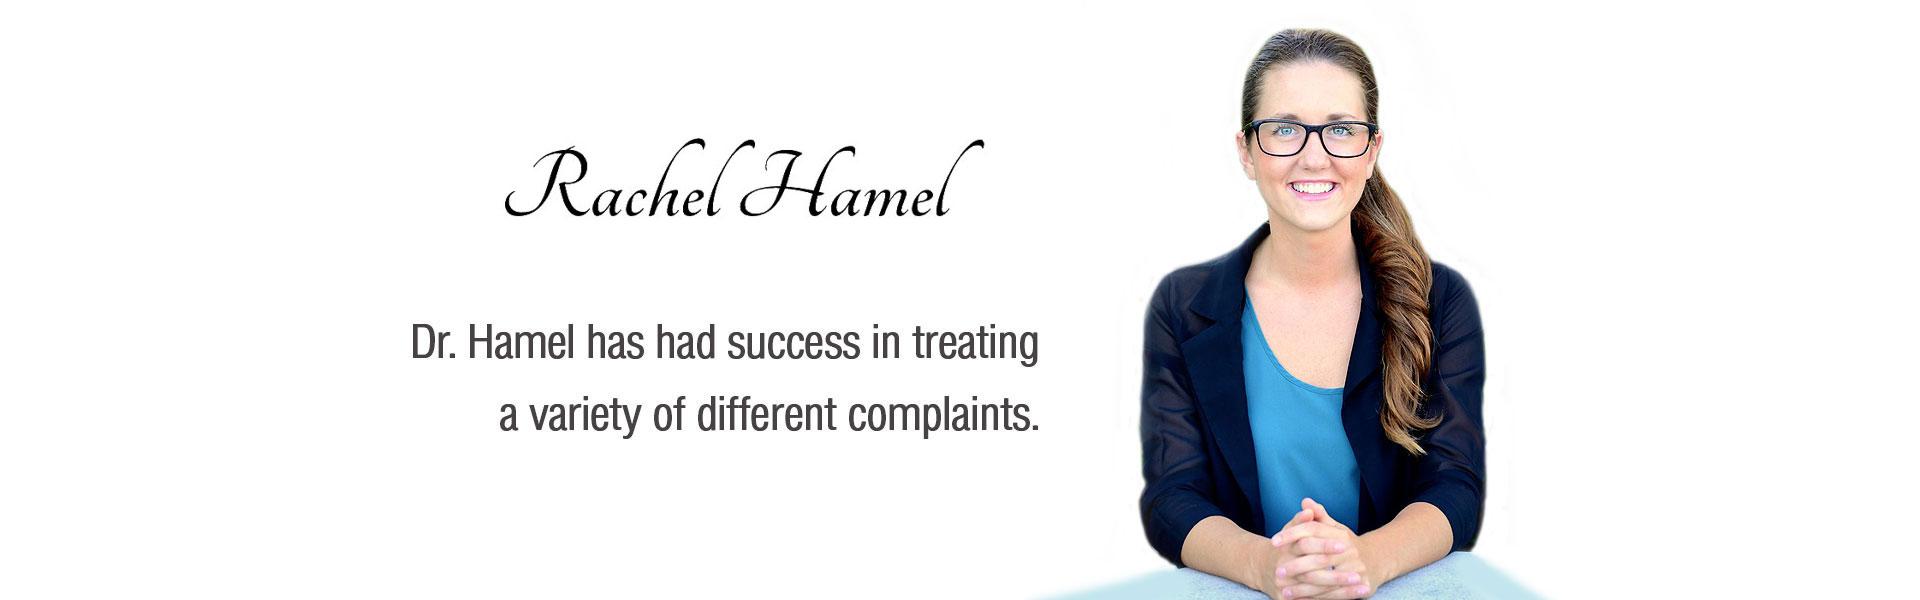 rachel-hamel-banner2-2